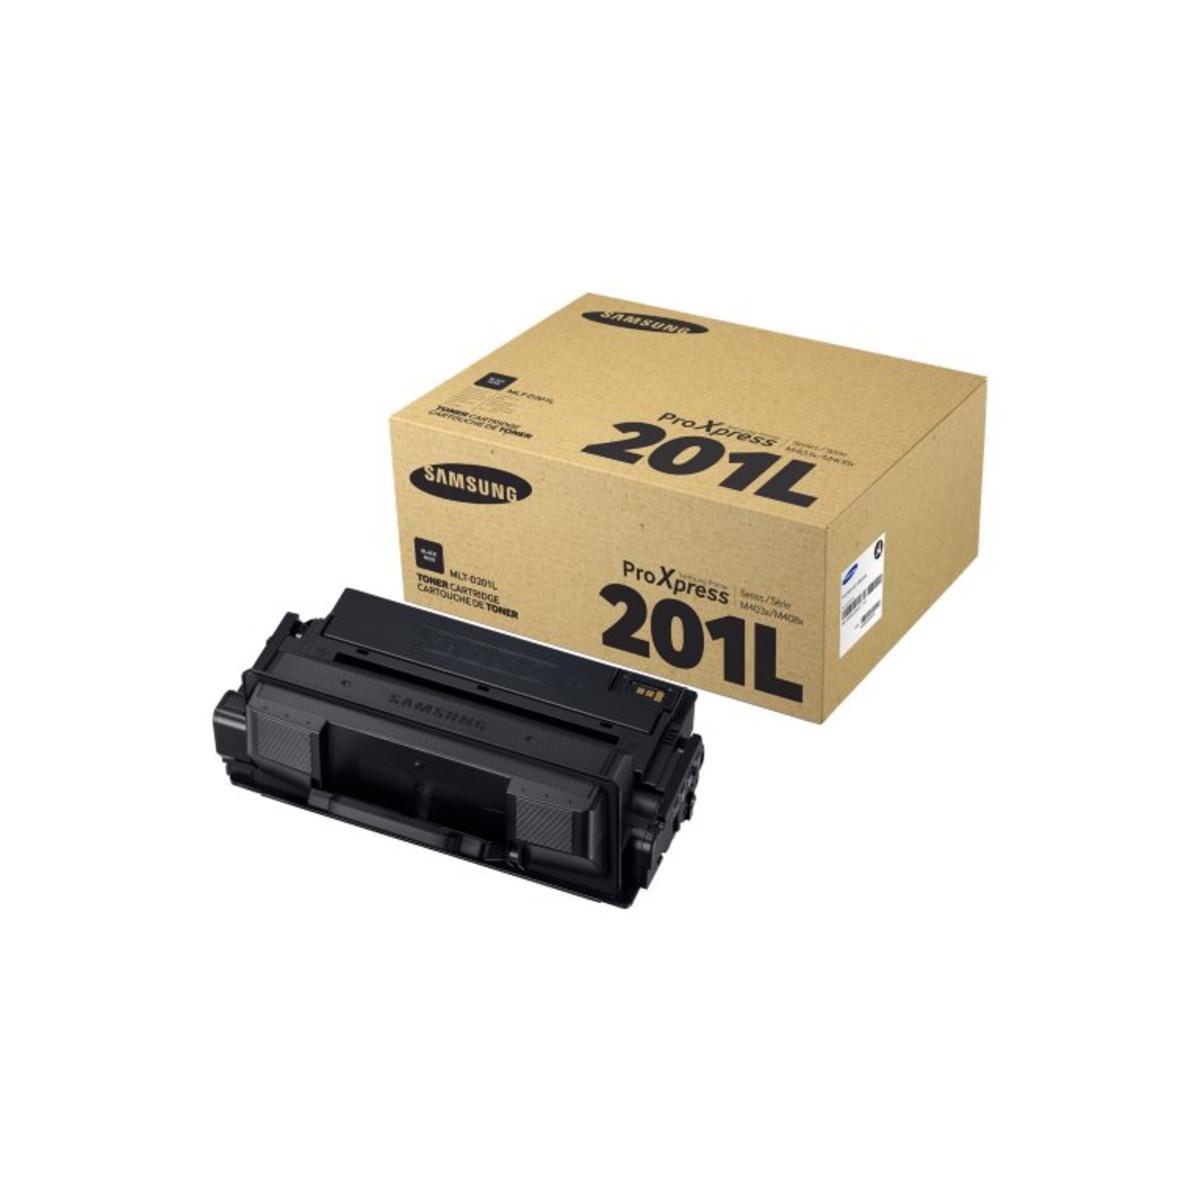 Samsung MLT-D201L Black Toner Cartridge